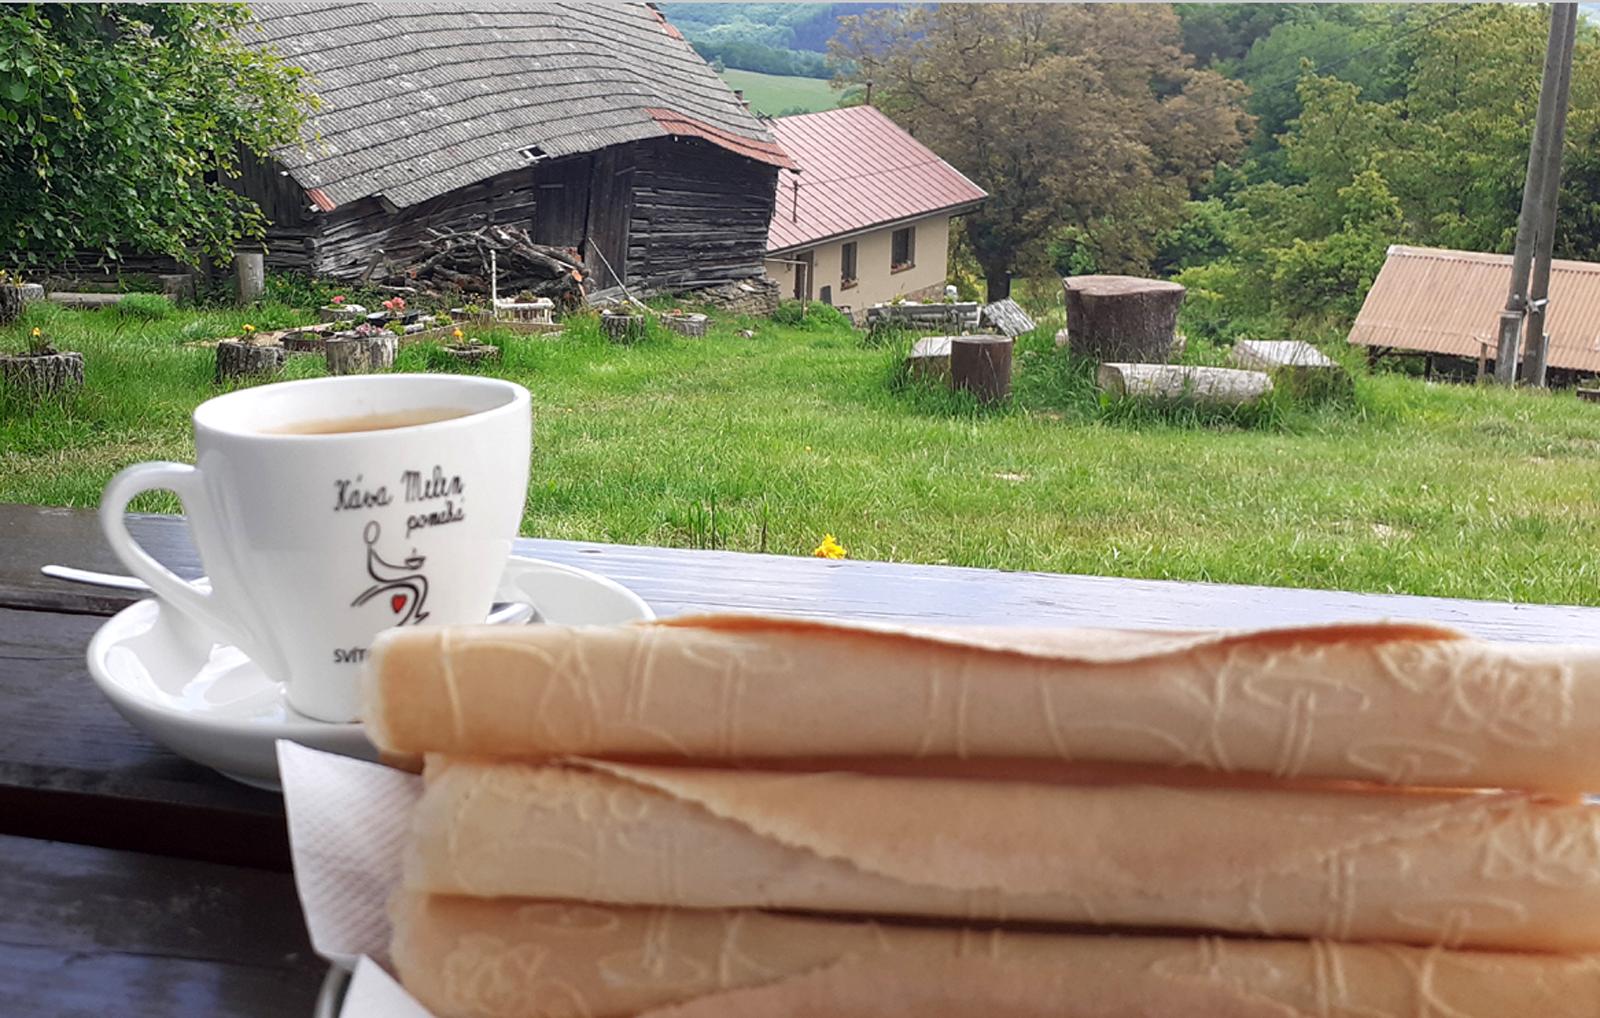 120 let stará stodola